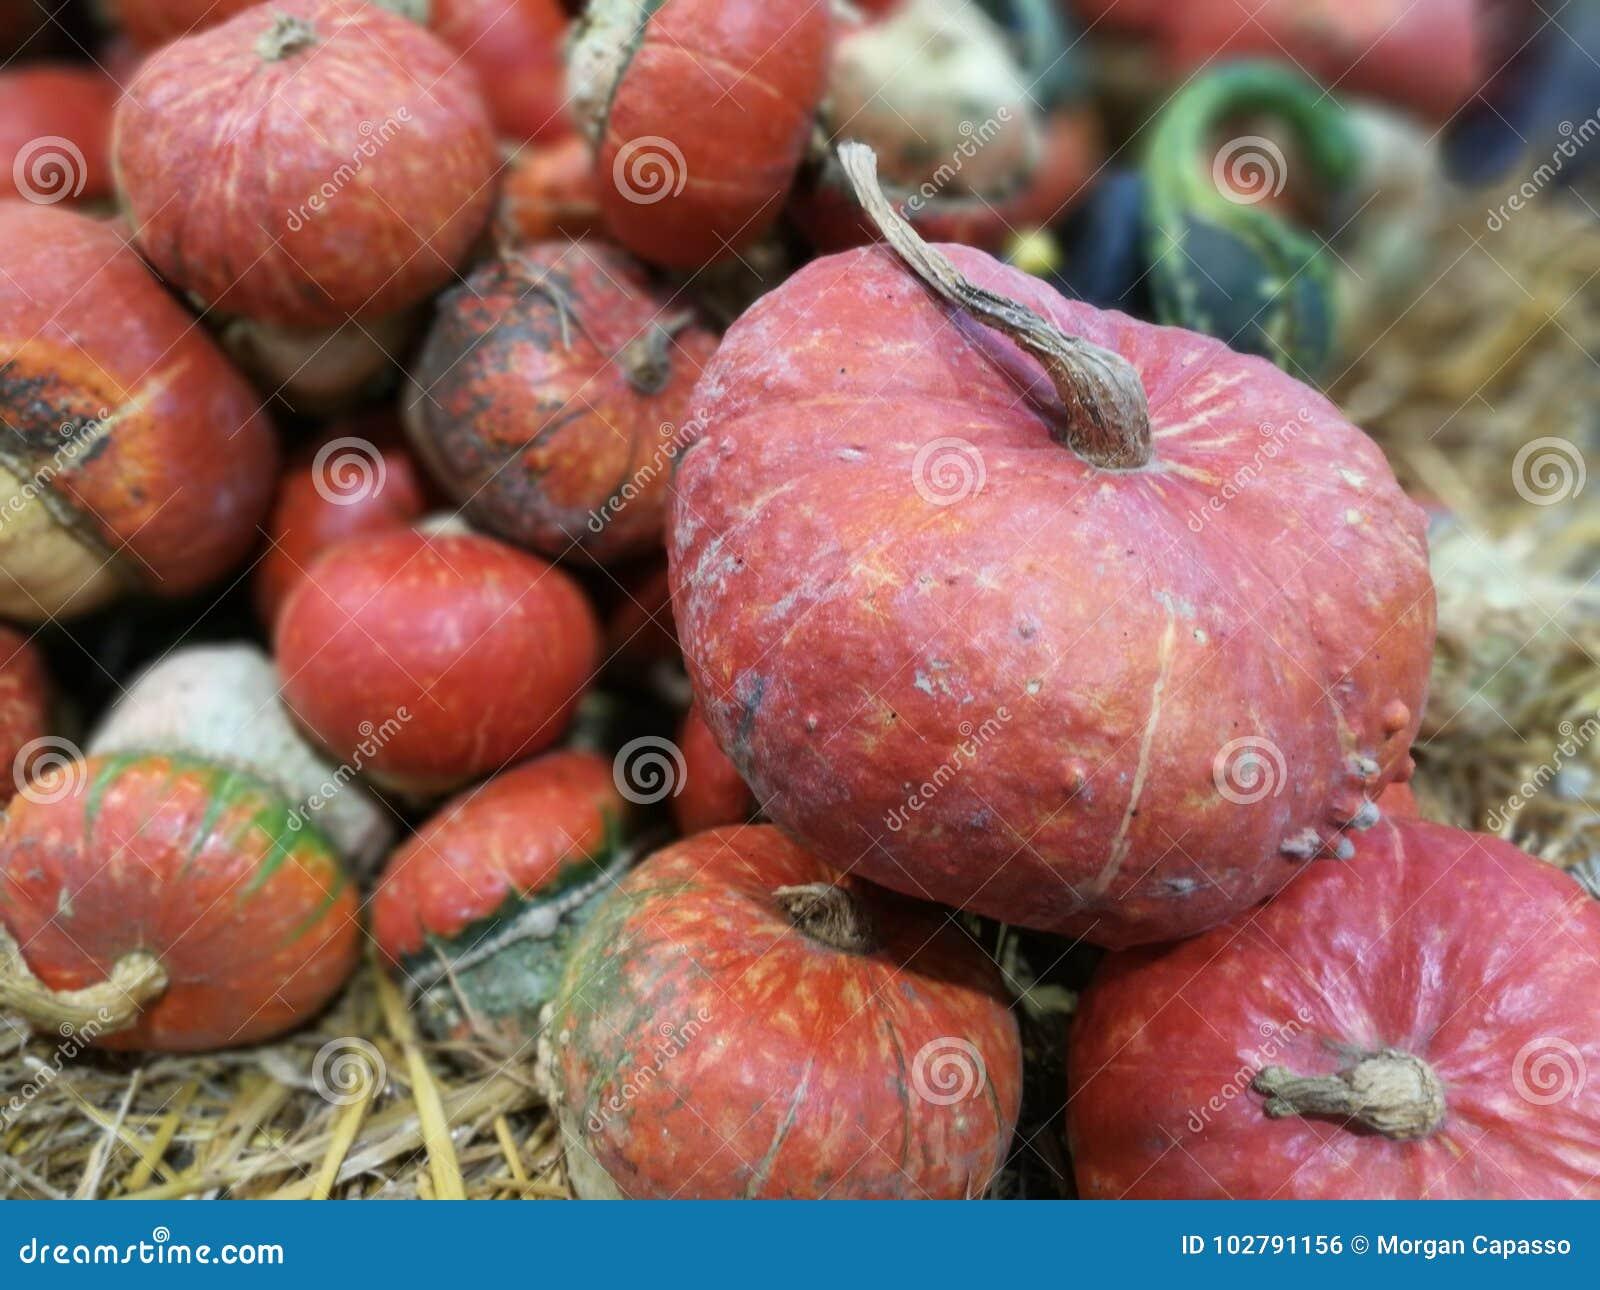 Many pumpkins on a farmers market